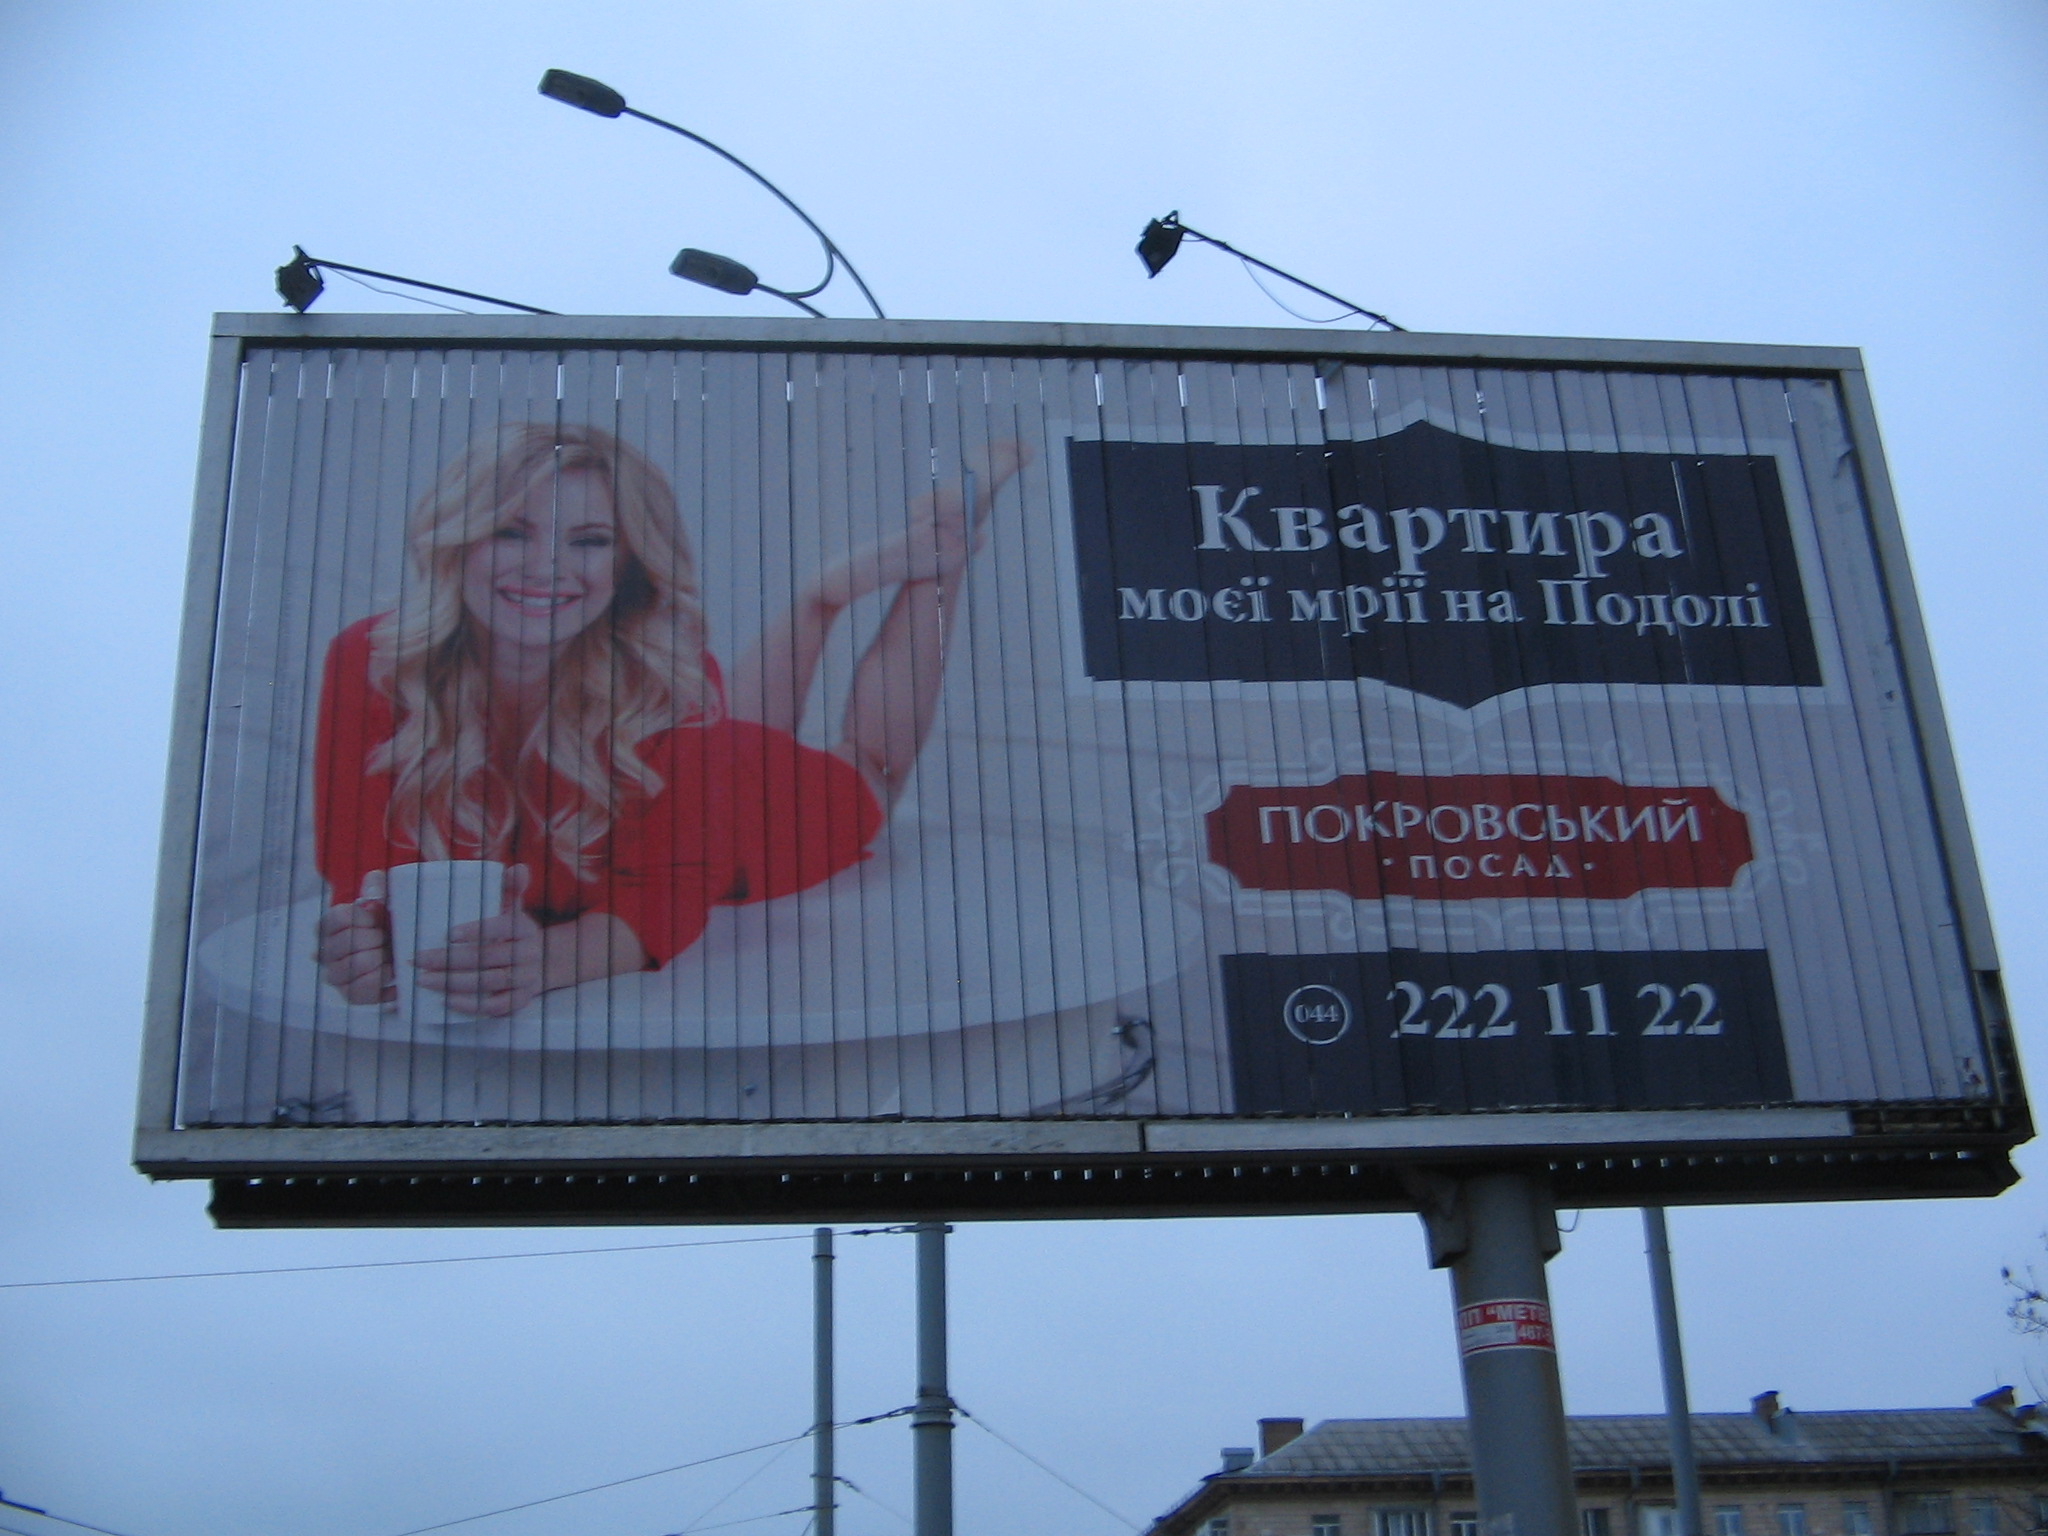 http://s6.uploads.ru/0jbNG.jpg